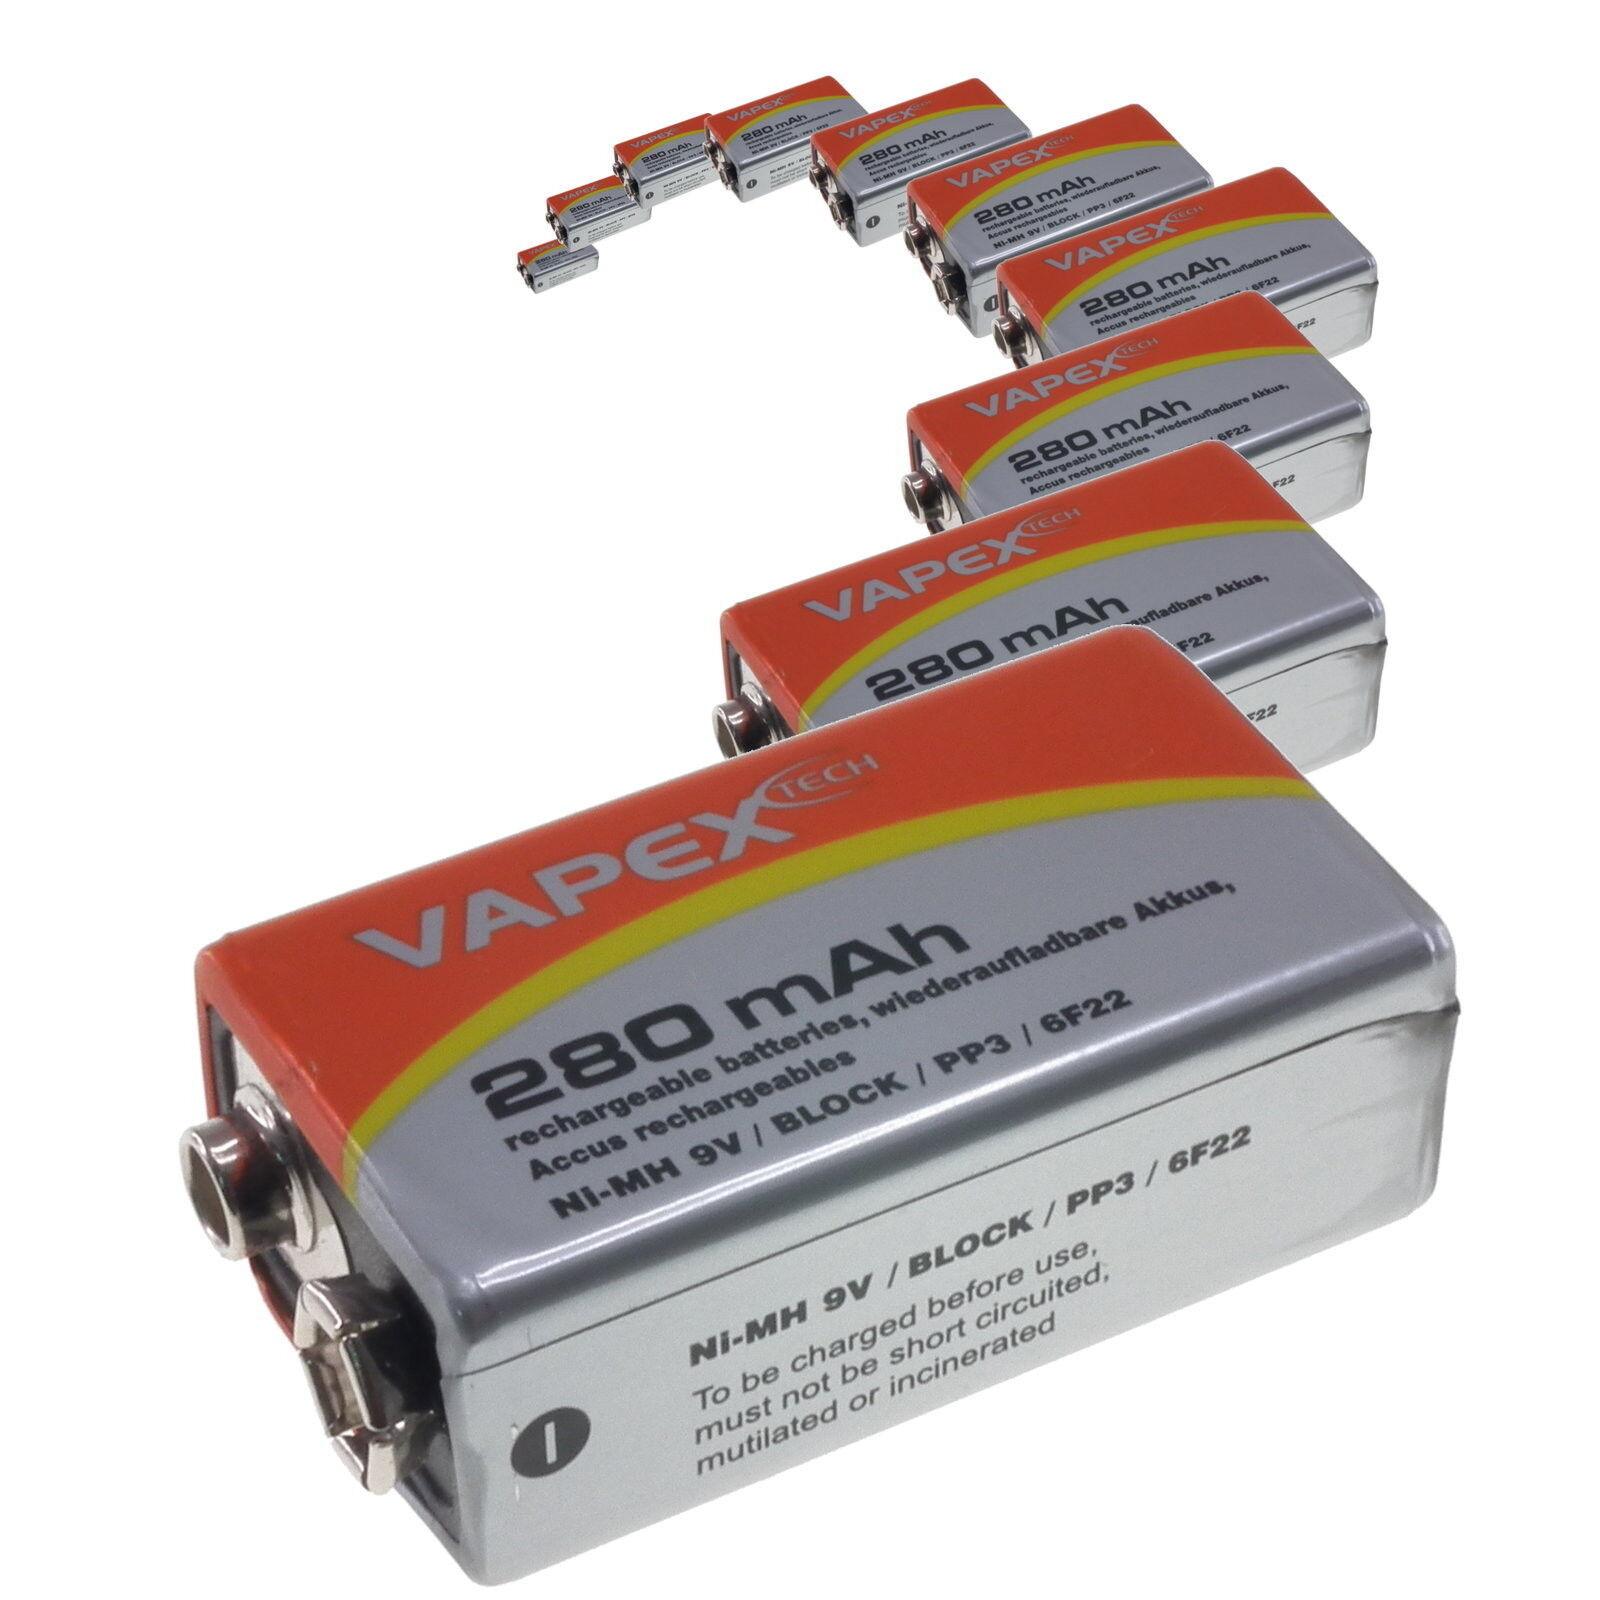 Replacement for 9V Alkaline 8.4V 280mAh rechargeable NiMH PP3 battery Vapex-Tech